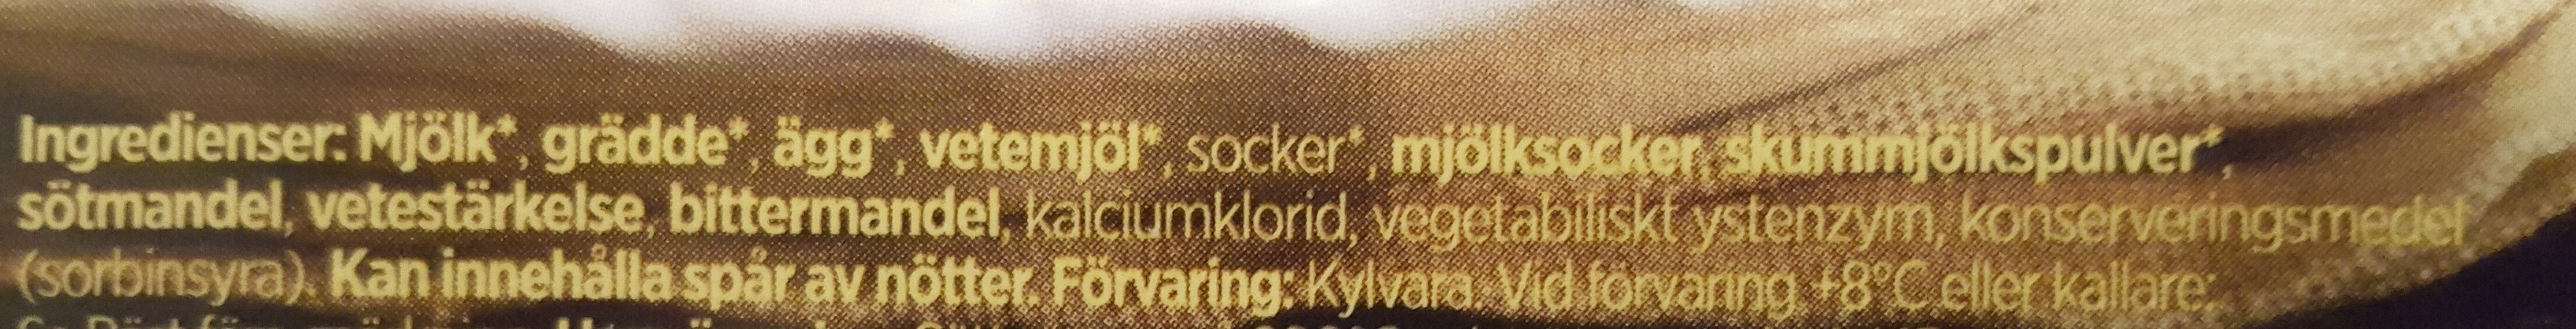 Frödinge Ostkaka - Ingredients